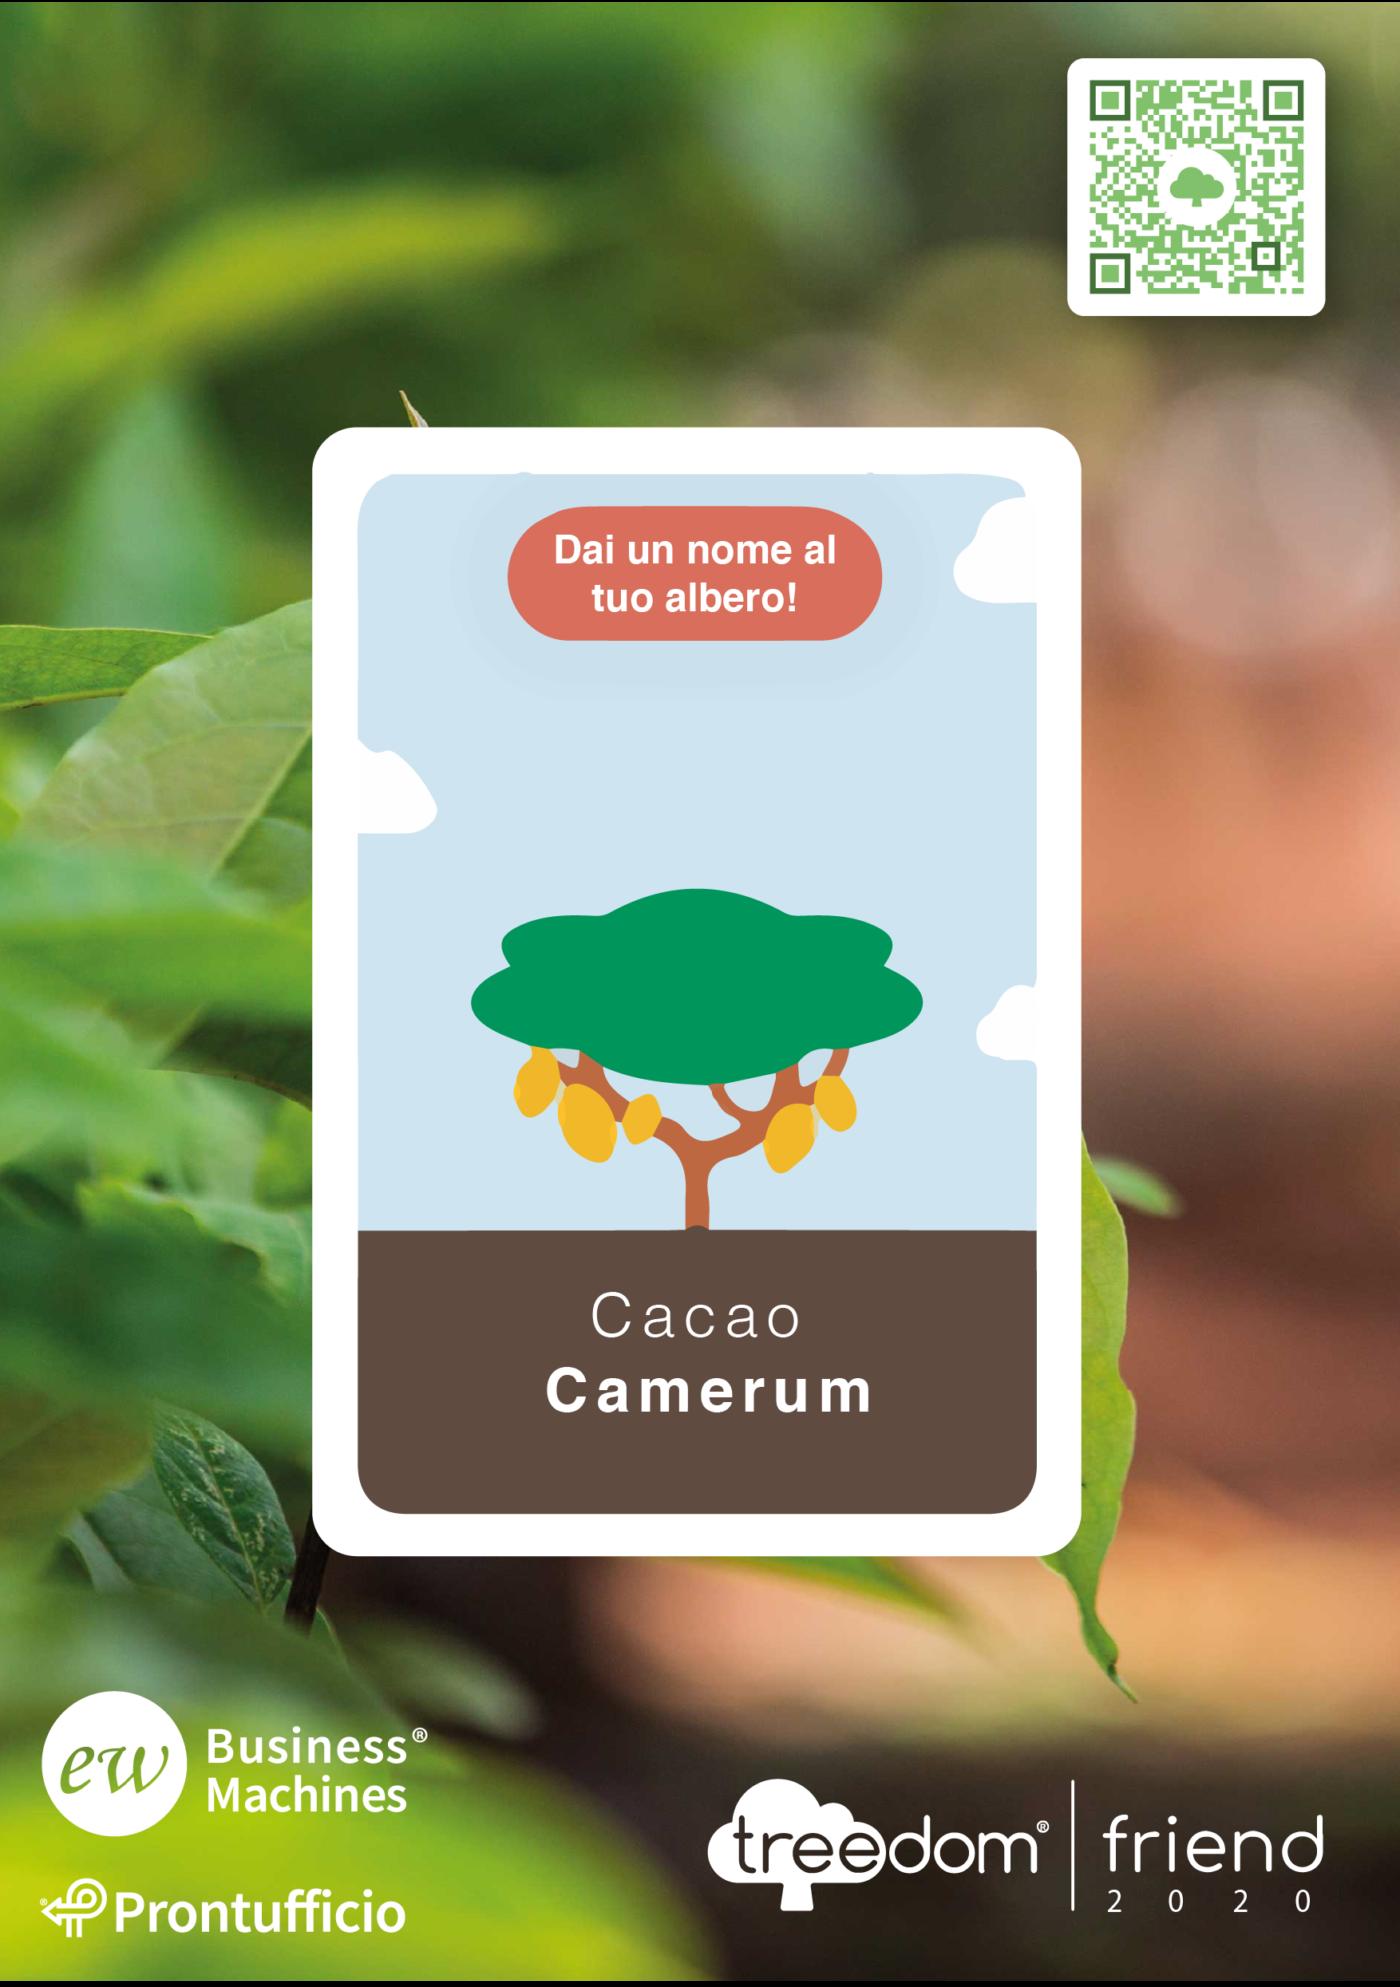 treedom - Foresta Camerun Ew Business Machines